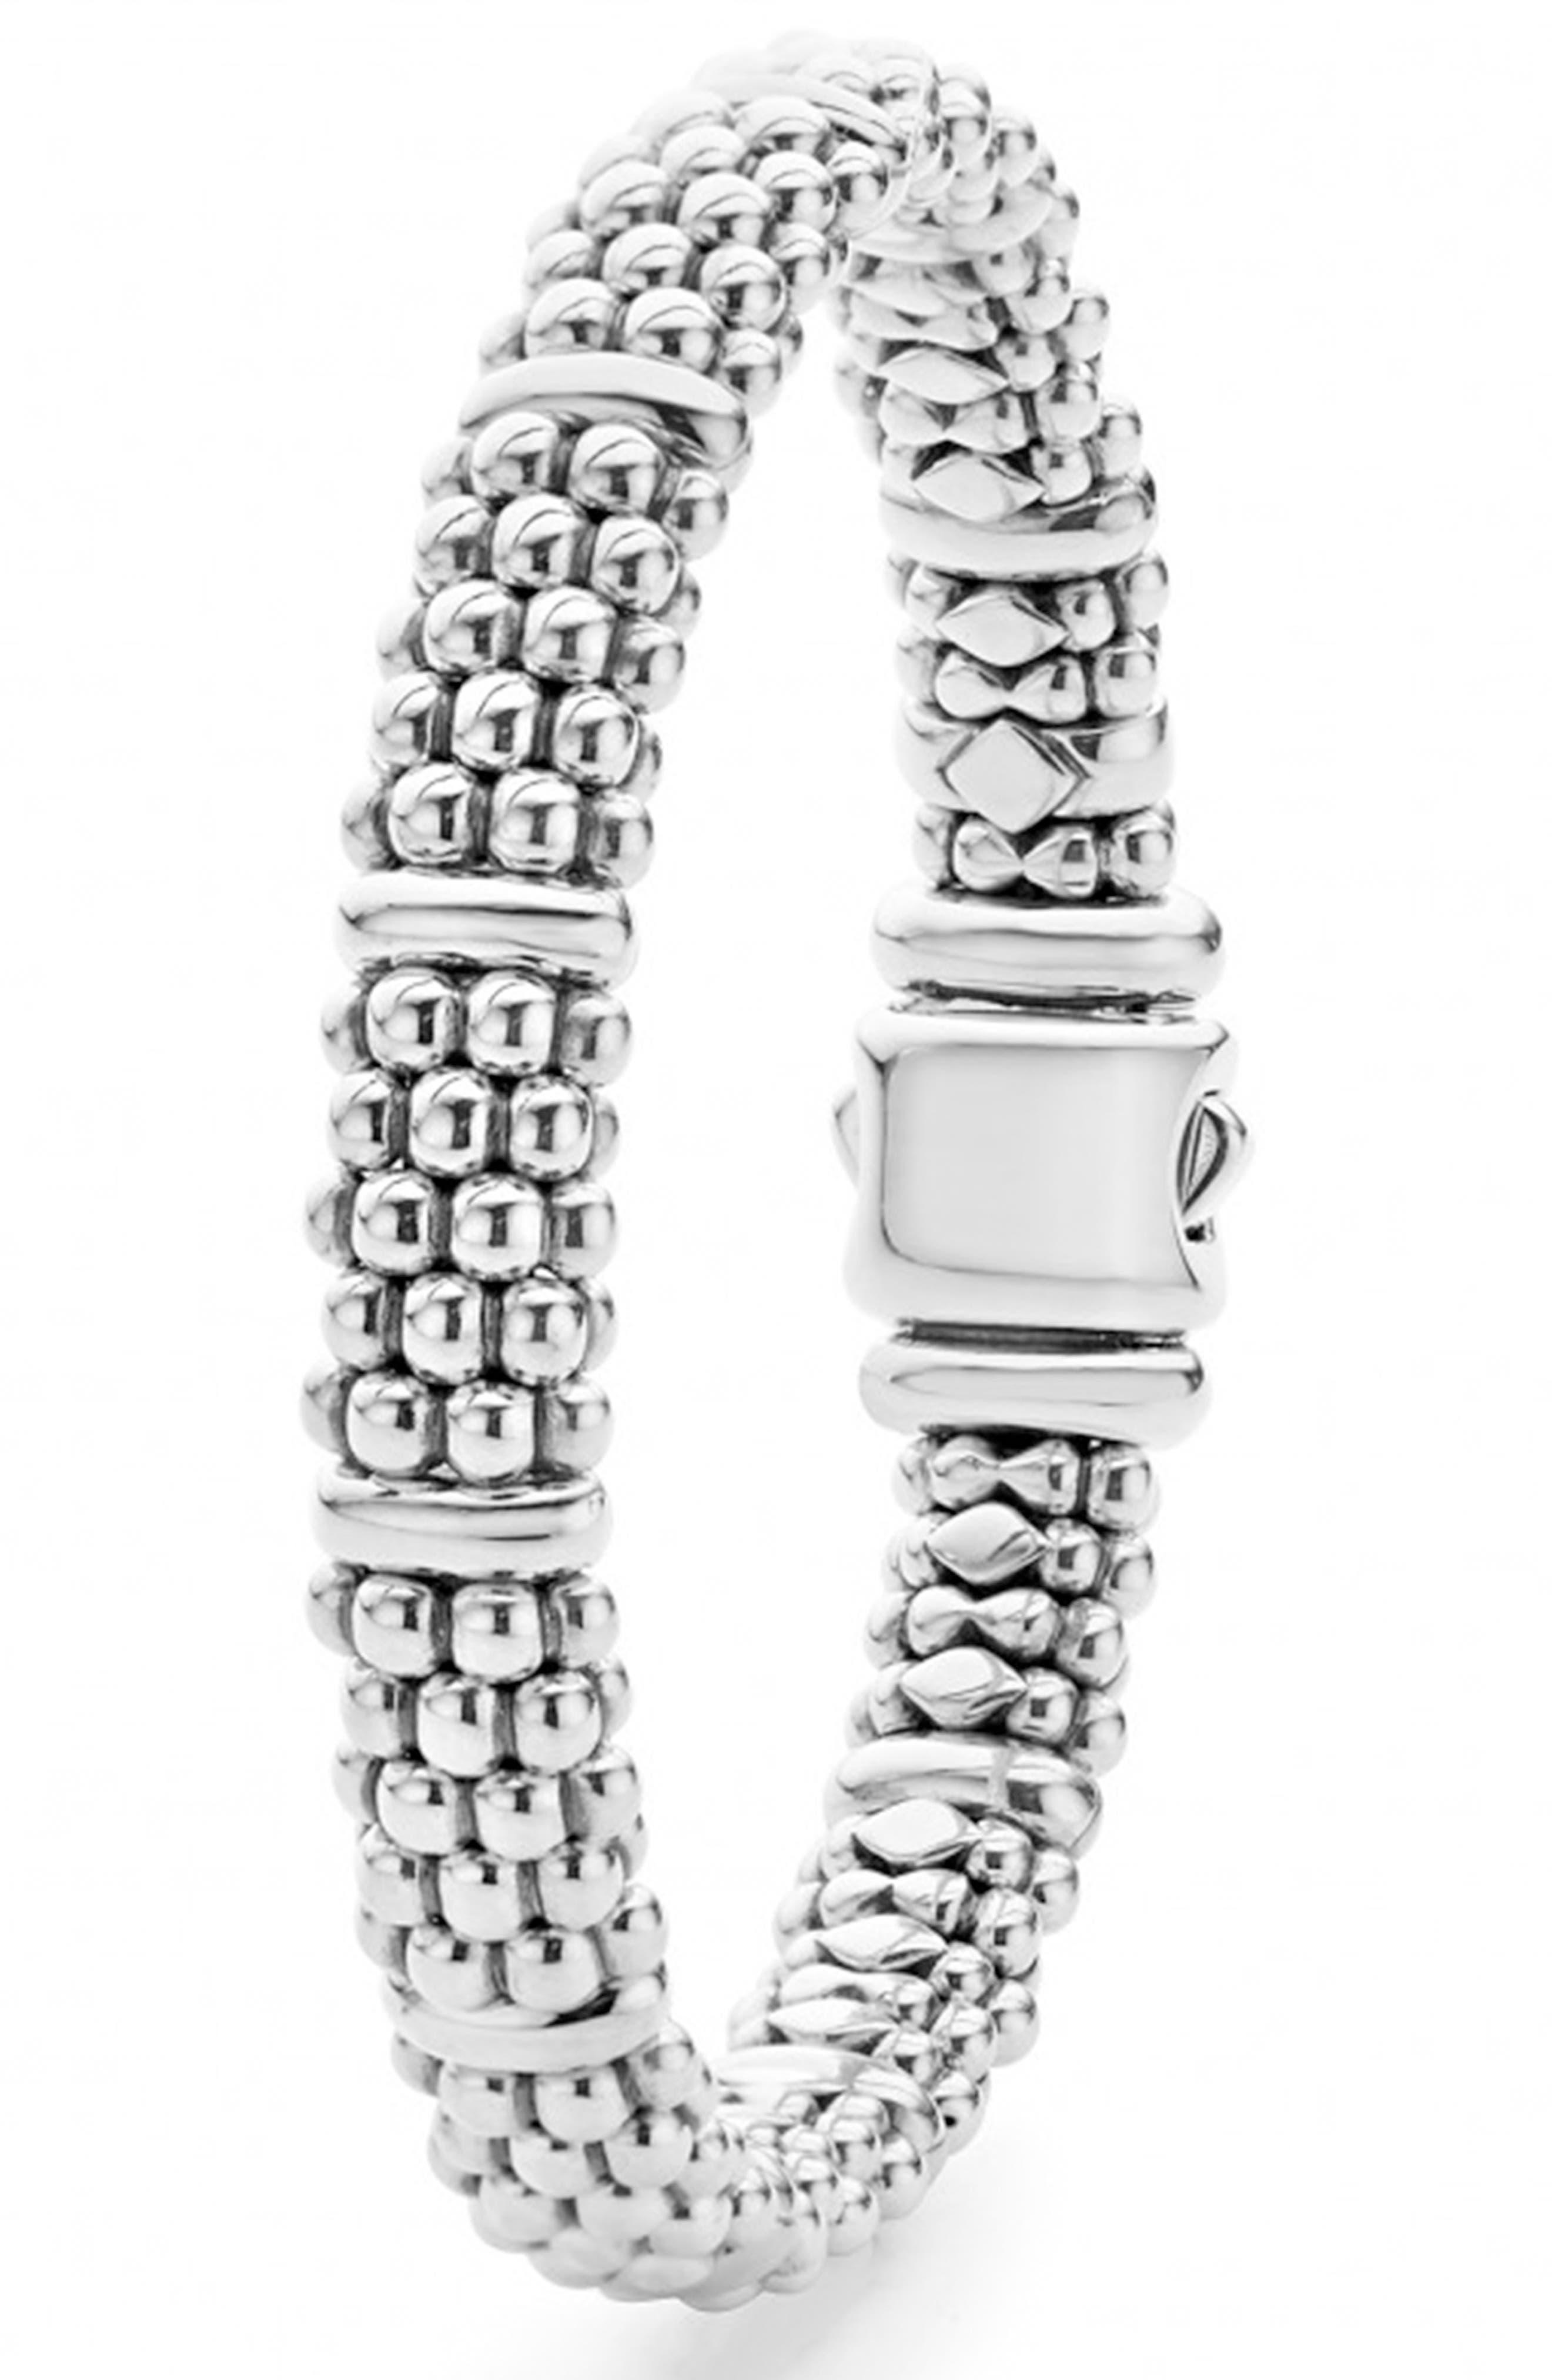 Oval Rope Caviar Bracelet,                             Alternate thumbnail 2, color,                             Silver